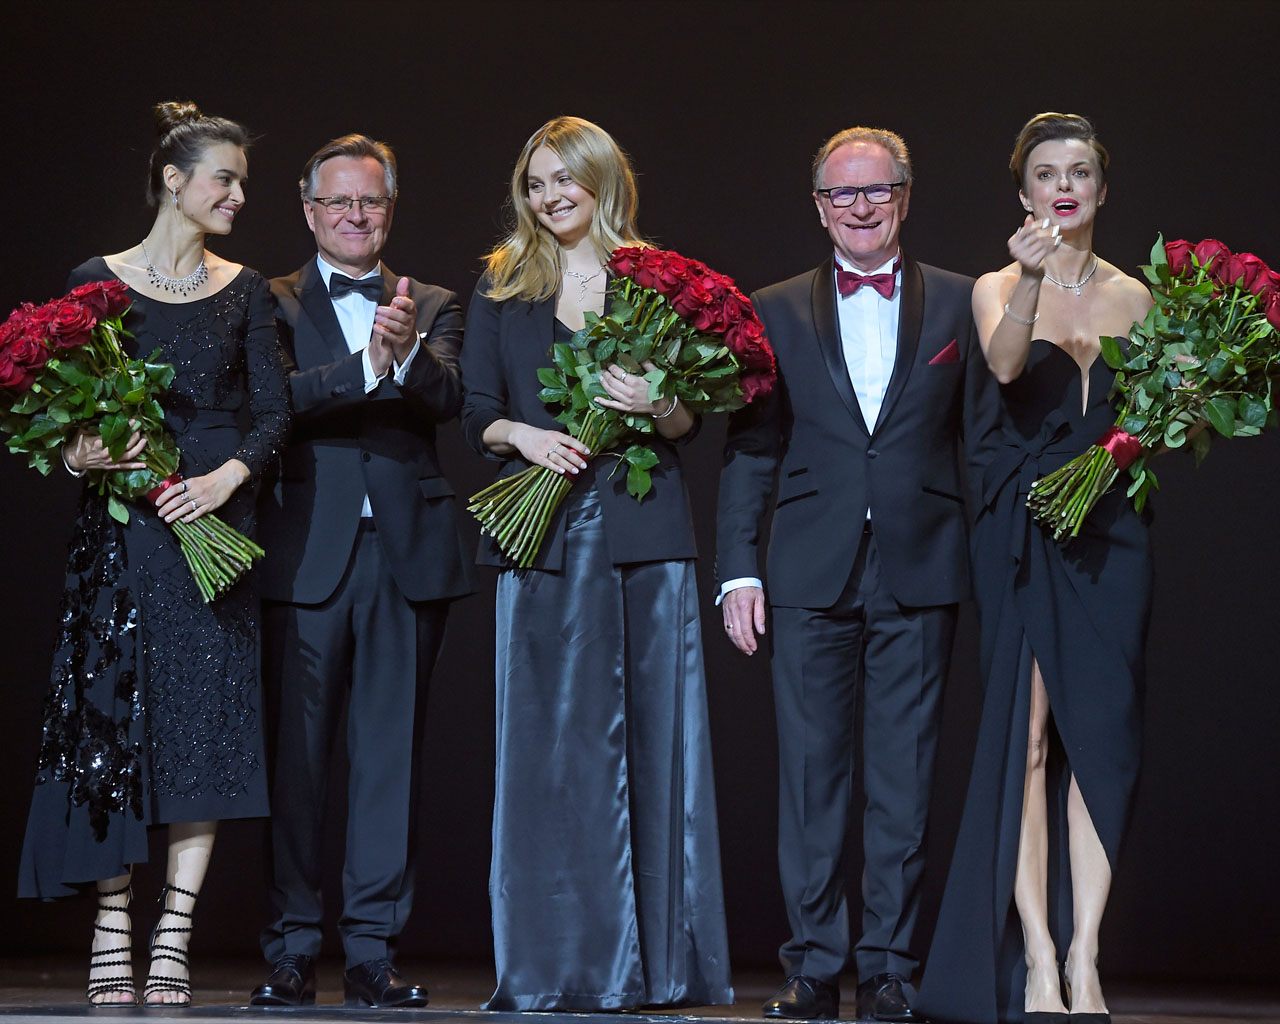 scena z: Adam Rączyński, Piotr Rączyński, Katarzyna Sokołowska, Małgorzata Socha, SK:, , fot. AKPA/AKPA